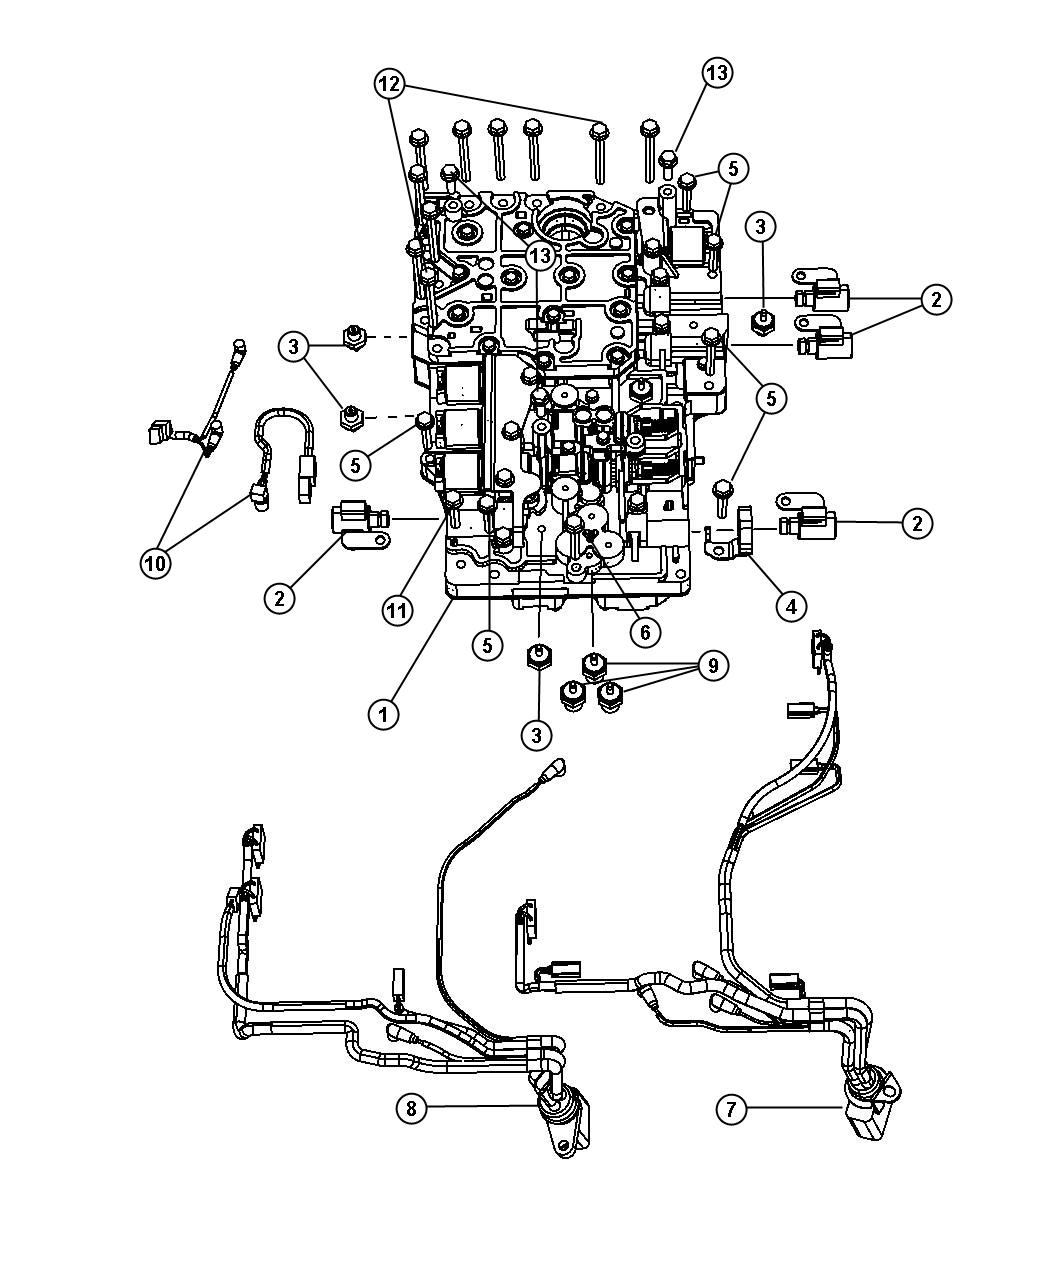 Dodge Ram Harness Wiring Transmission 12 Pin